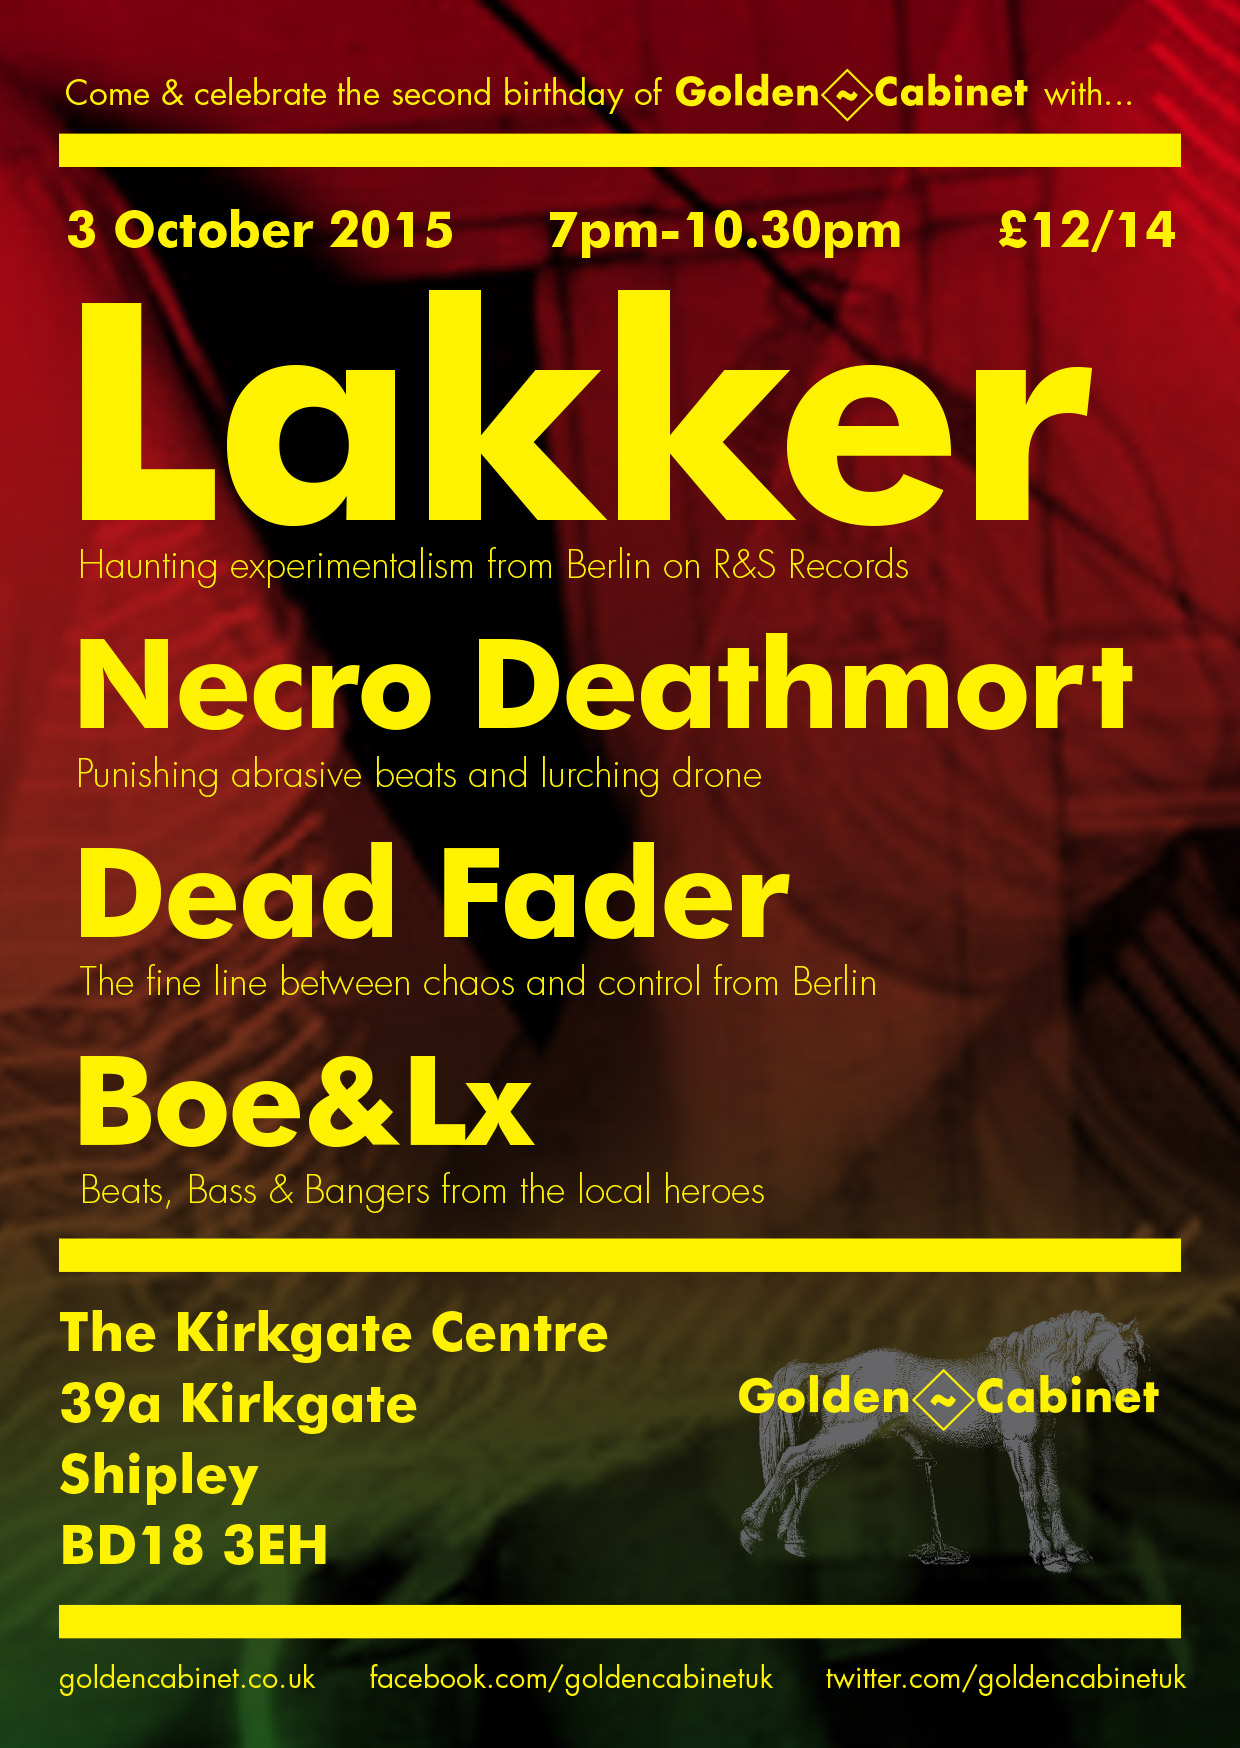 golden_cabinet_lakker_A6_flyer